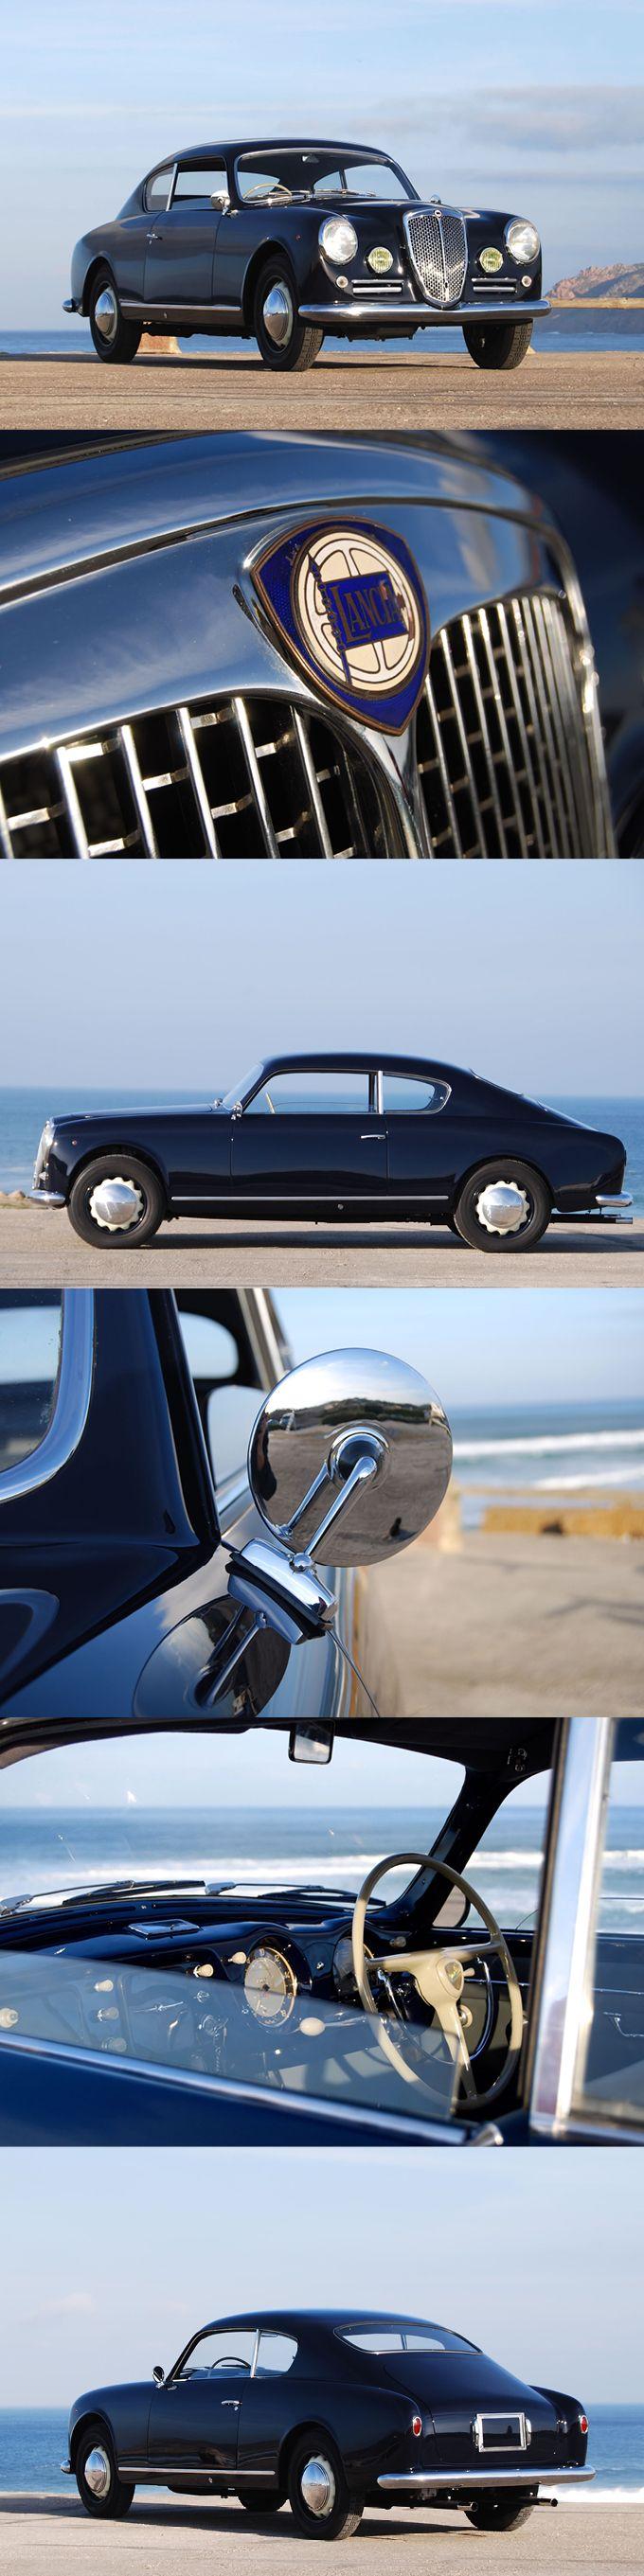 334 best lancia images on pinterest car vintage cars and doors 1952 lancia aurelia gt b20 80hp 20l v6 ghia black vanachro Choice Image